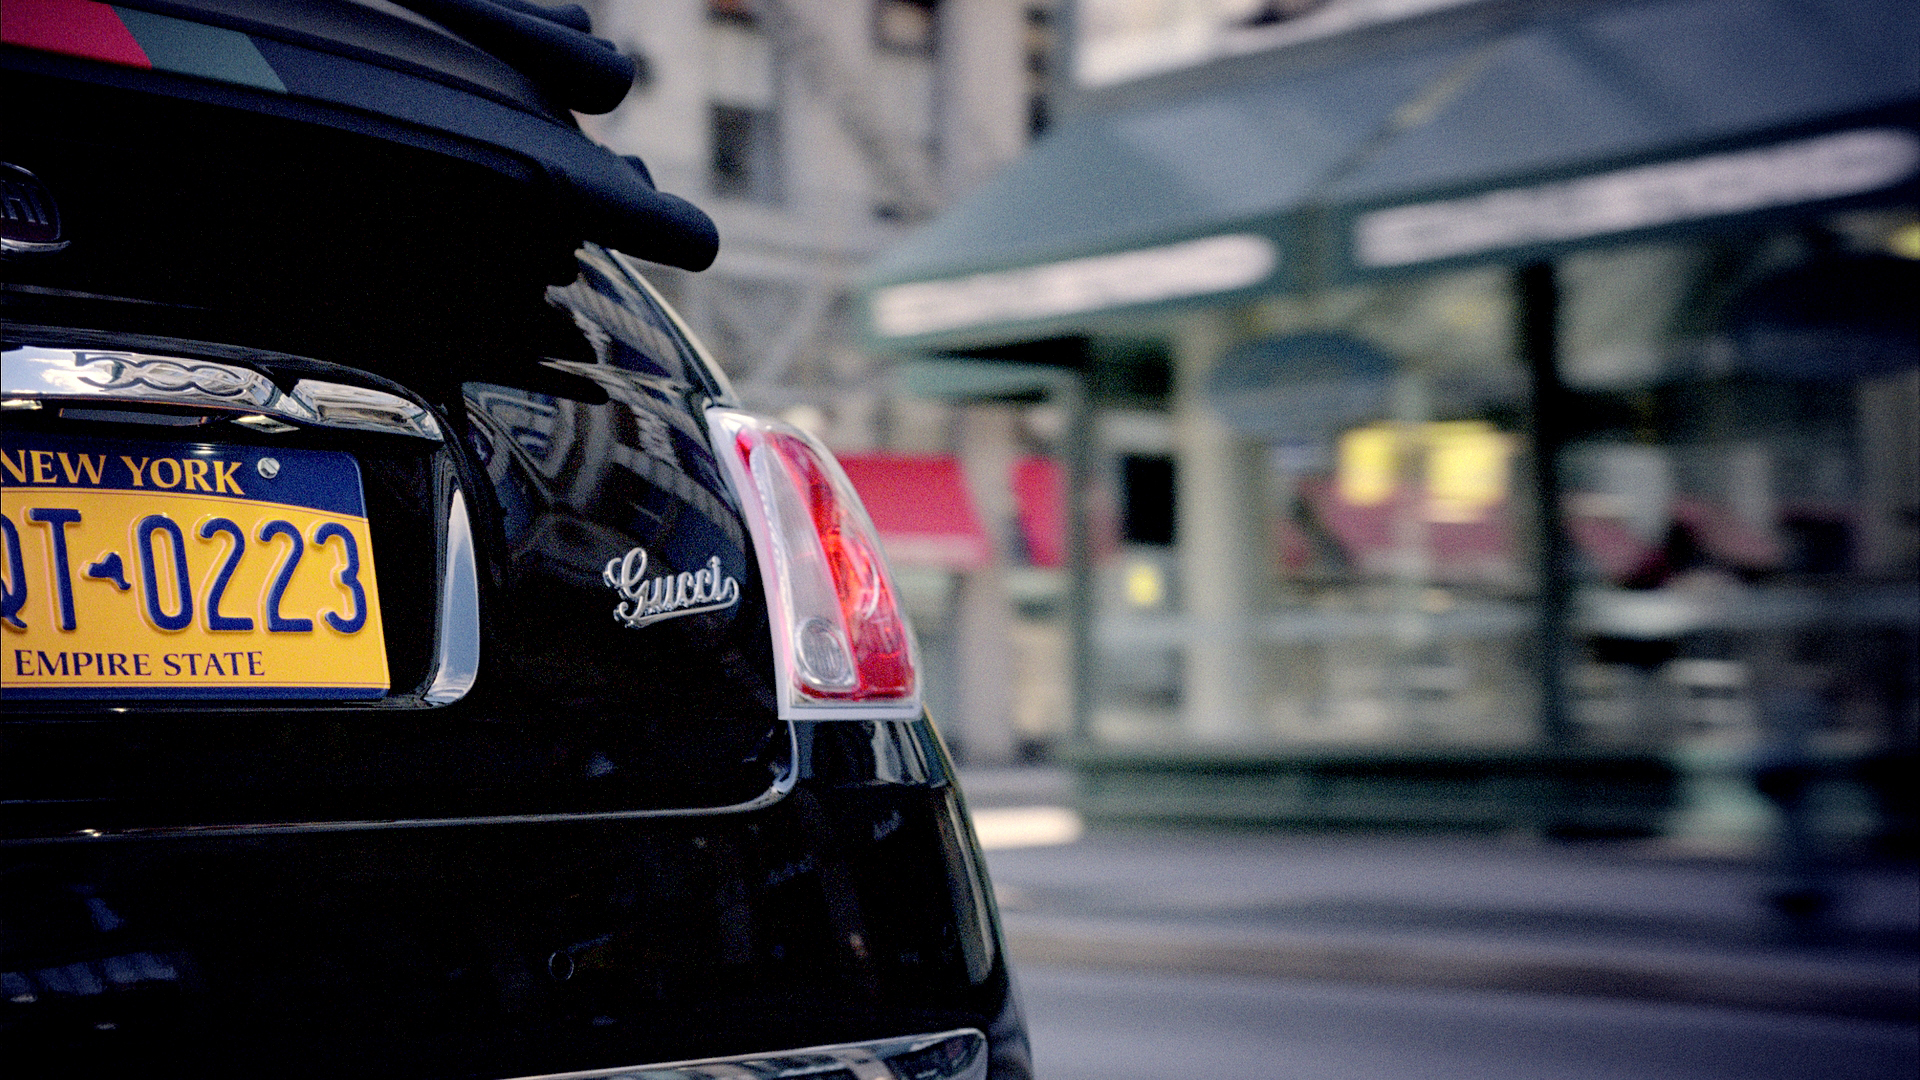 2012 Fiat 500 Gucci badge